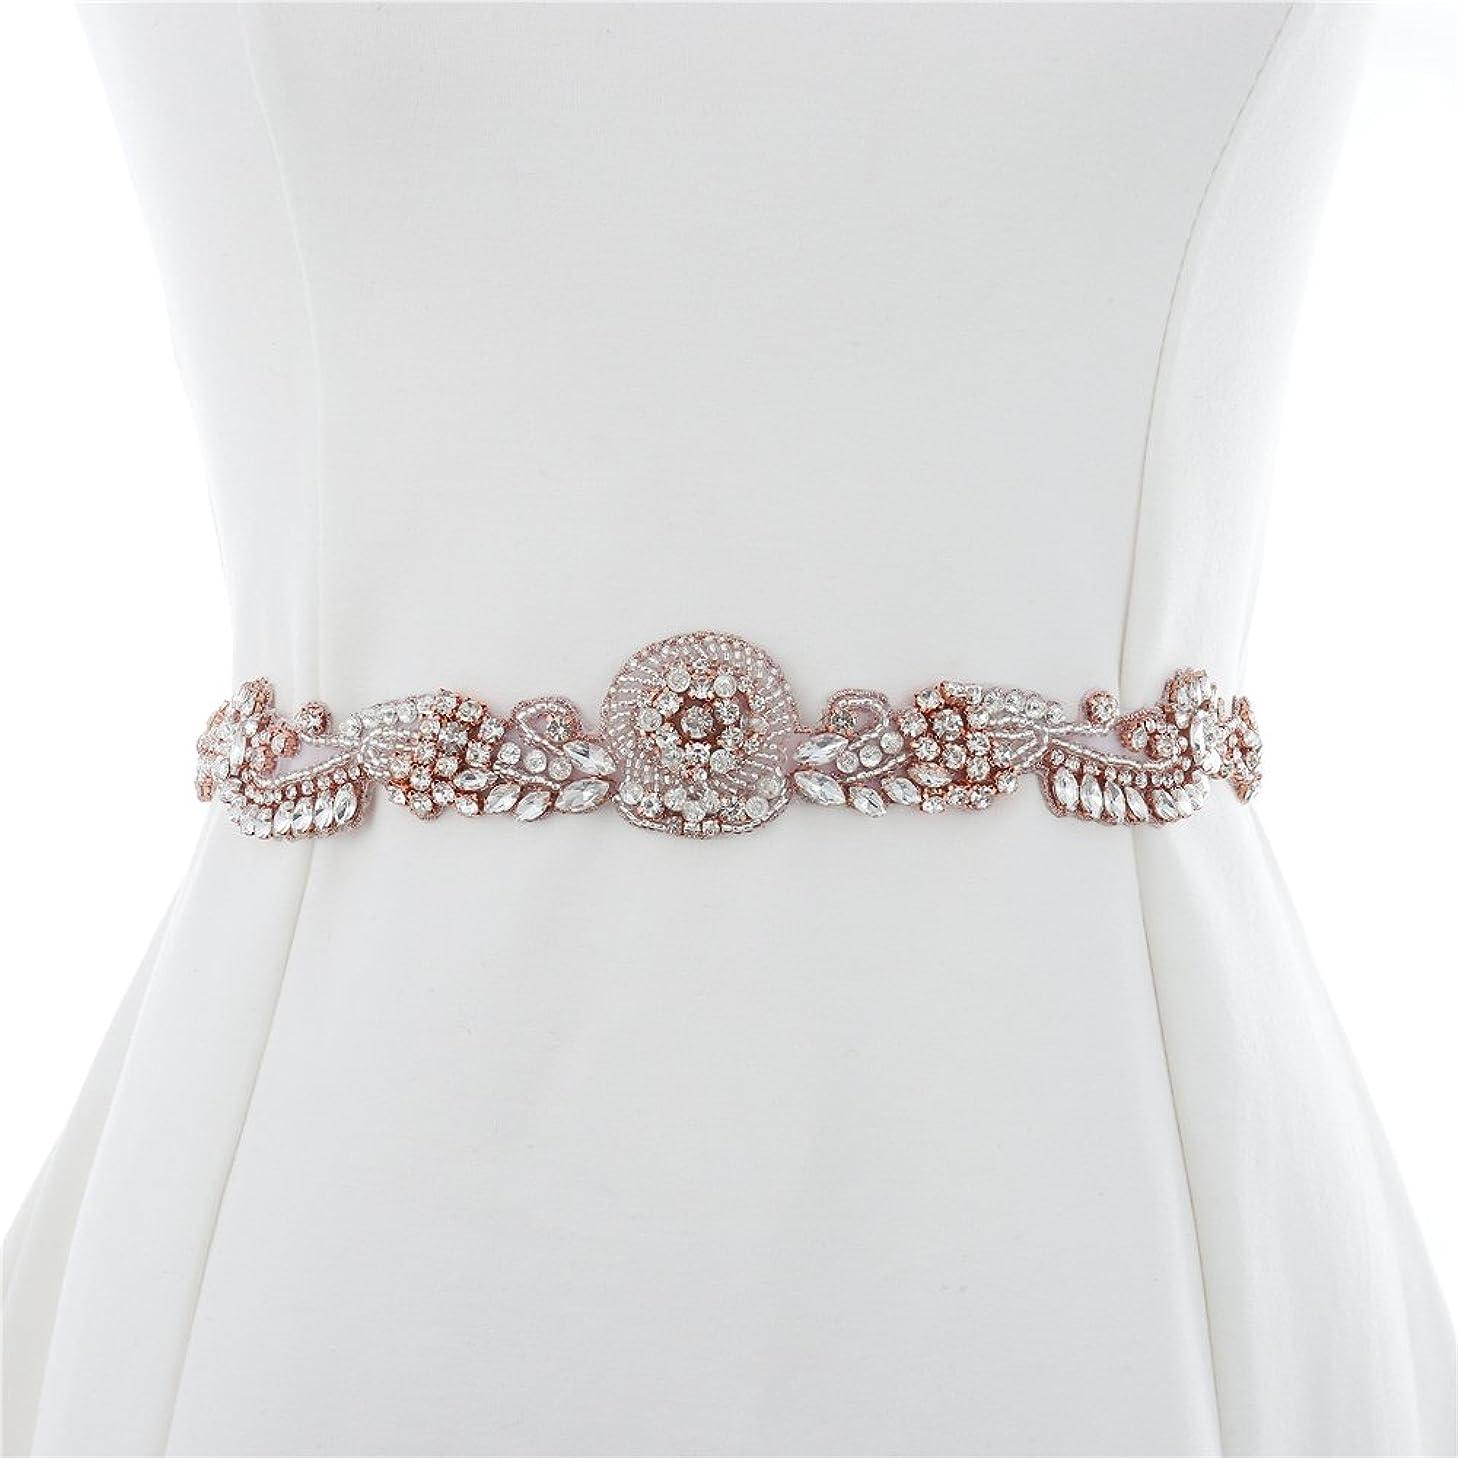 XINFANGXIU Rose Gold Bridal Wedding Dress Applique Beaded Rhinestone Belt Crystal Sash Applique Bridemaid Gown Women Prom Formal Dress Belt Applique Jeweled Embellishment Clothes Accessories